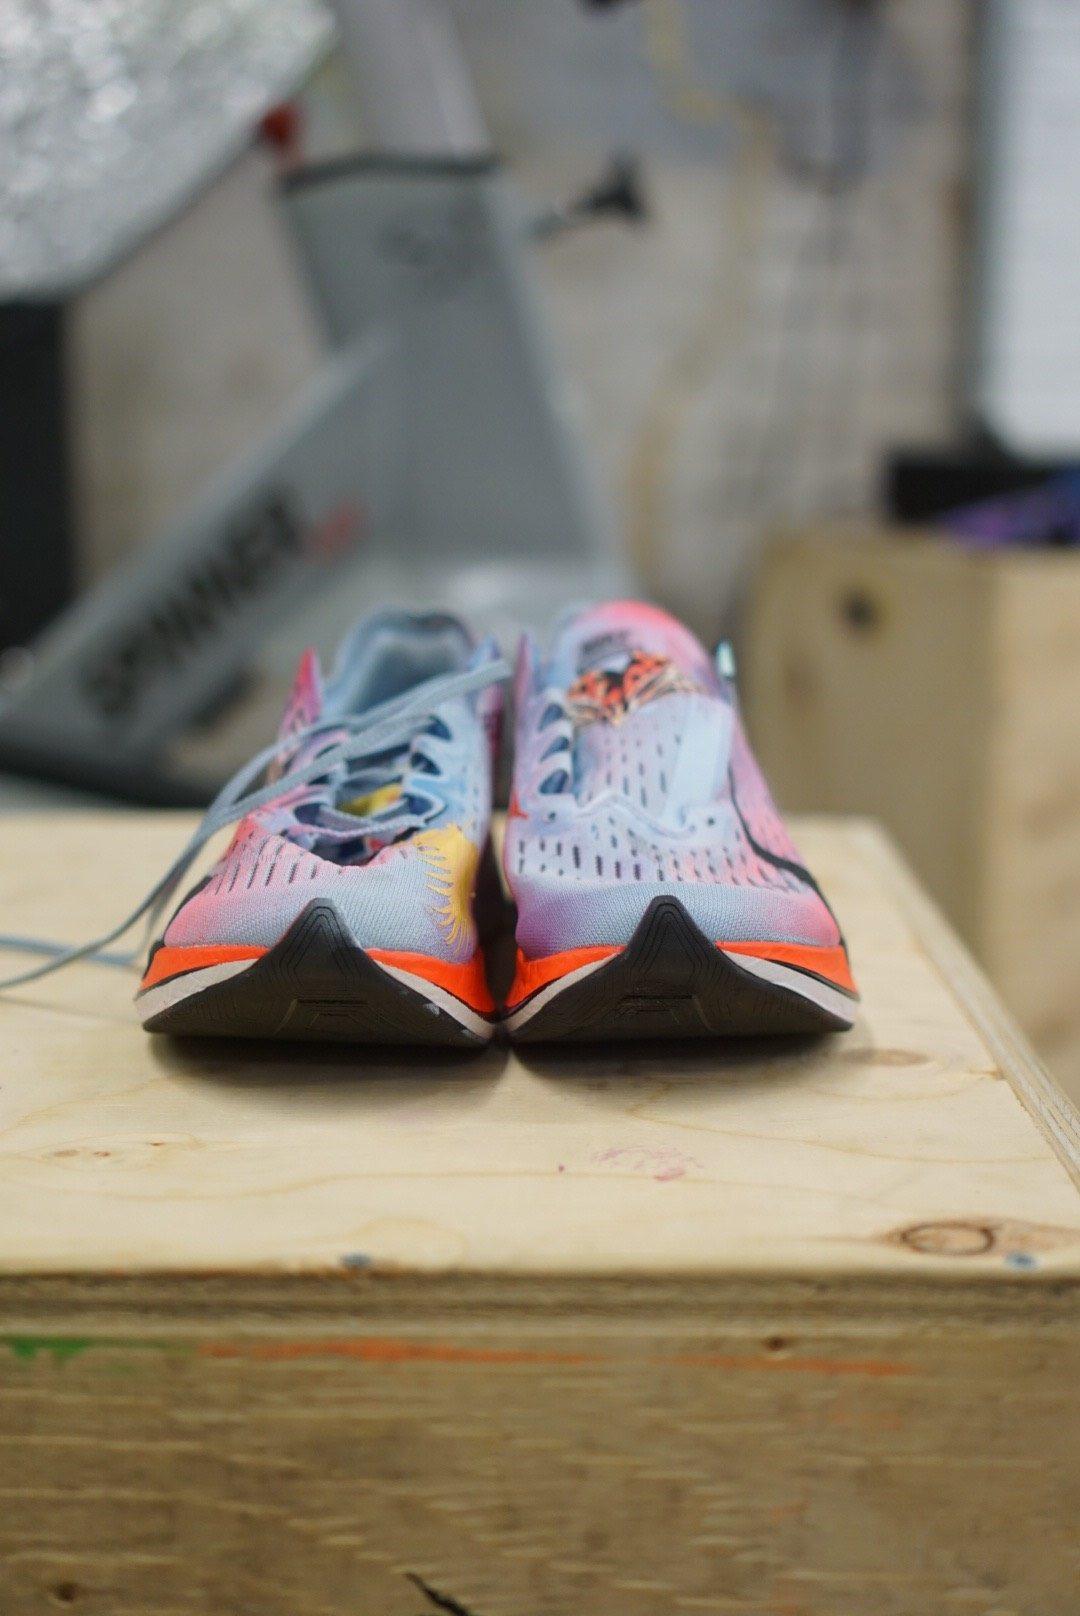 Custom Nike Vaporfly 4%